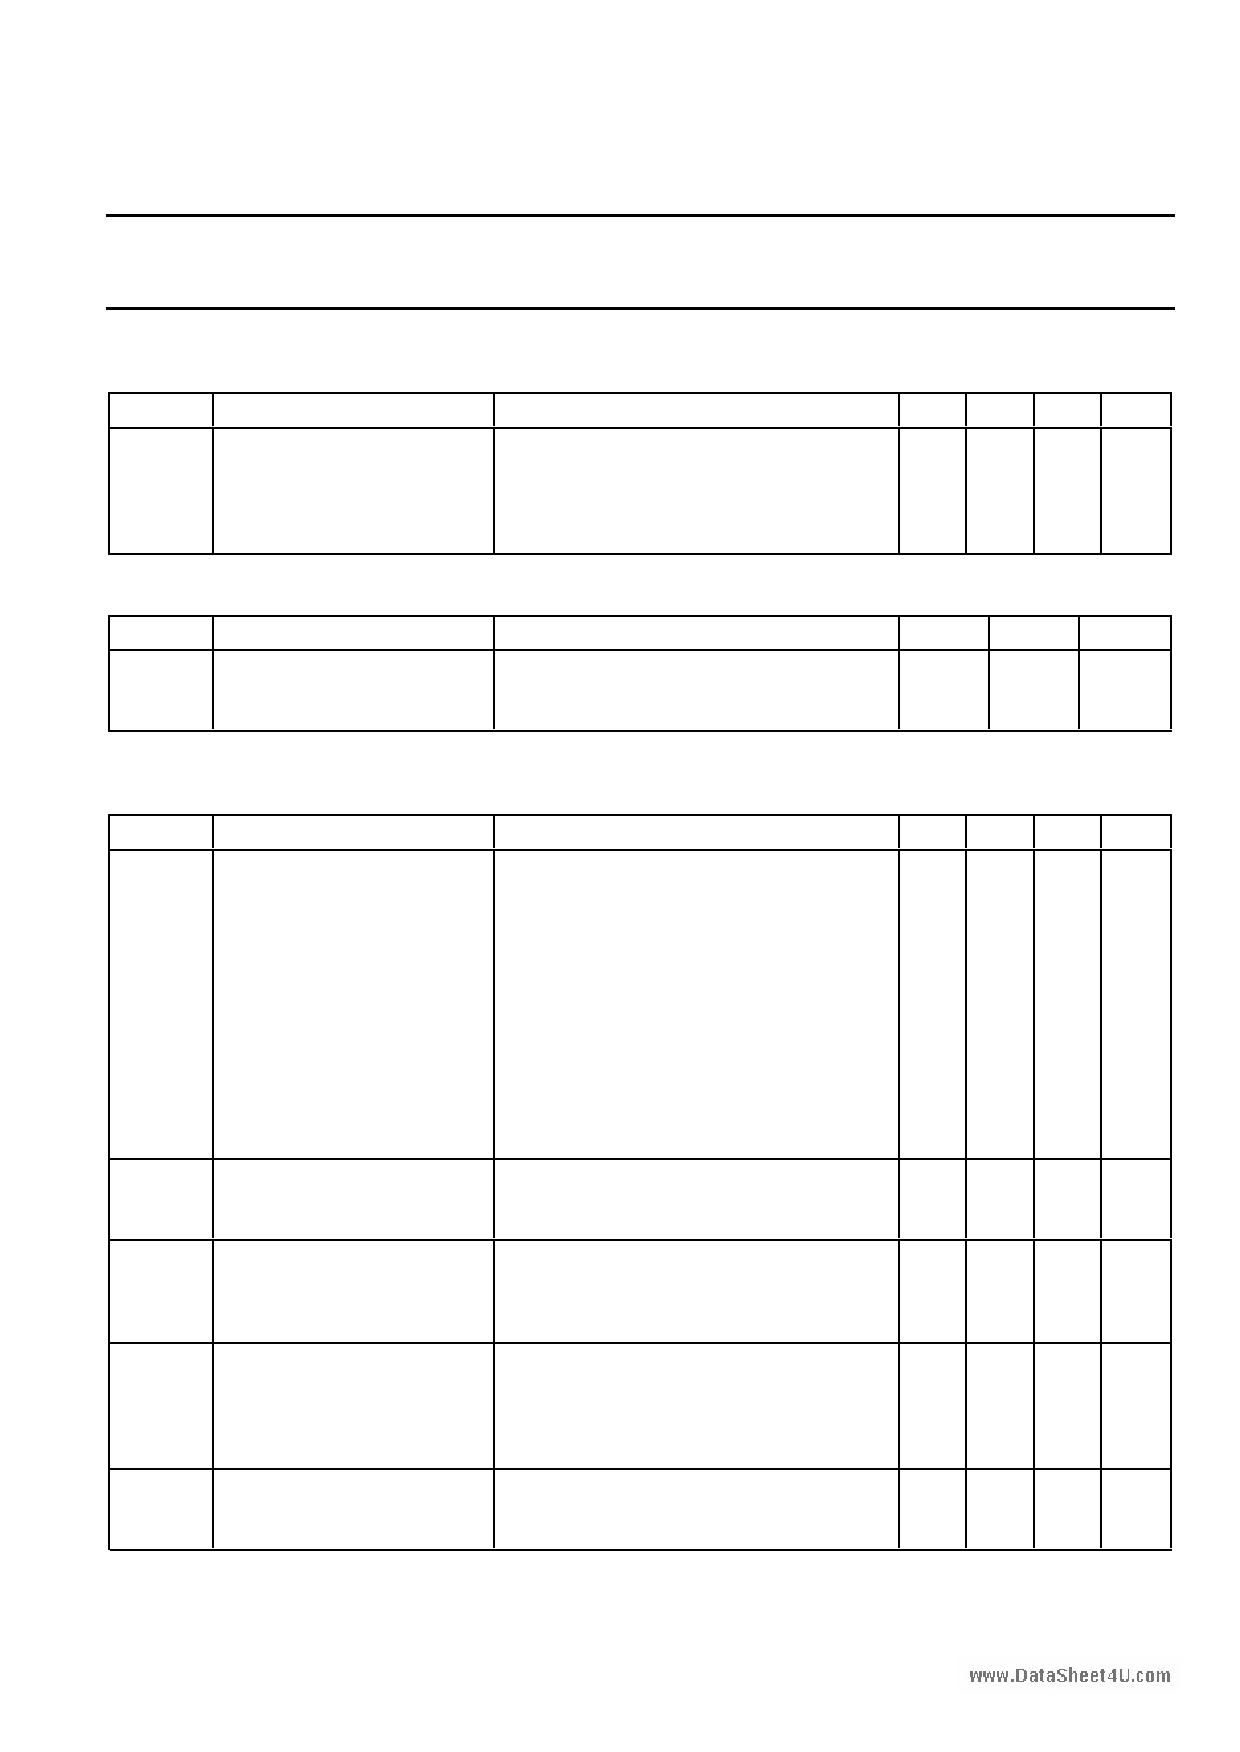 55N03LT pdf schematic